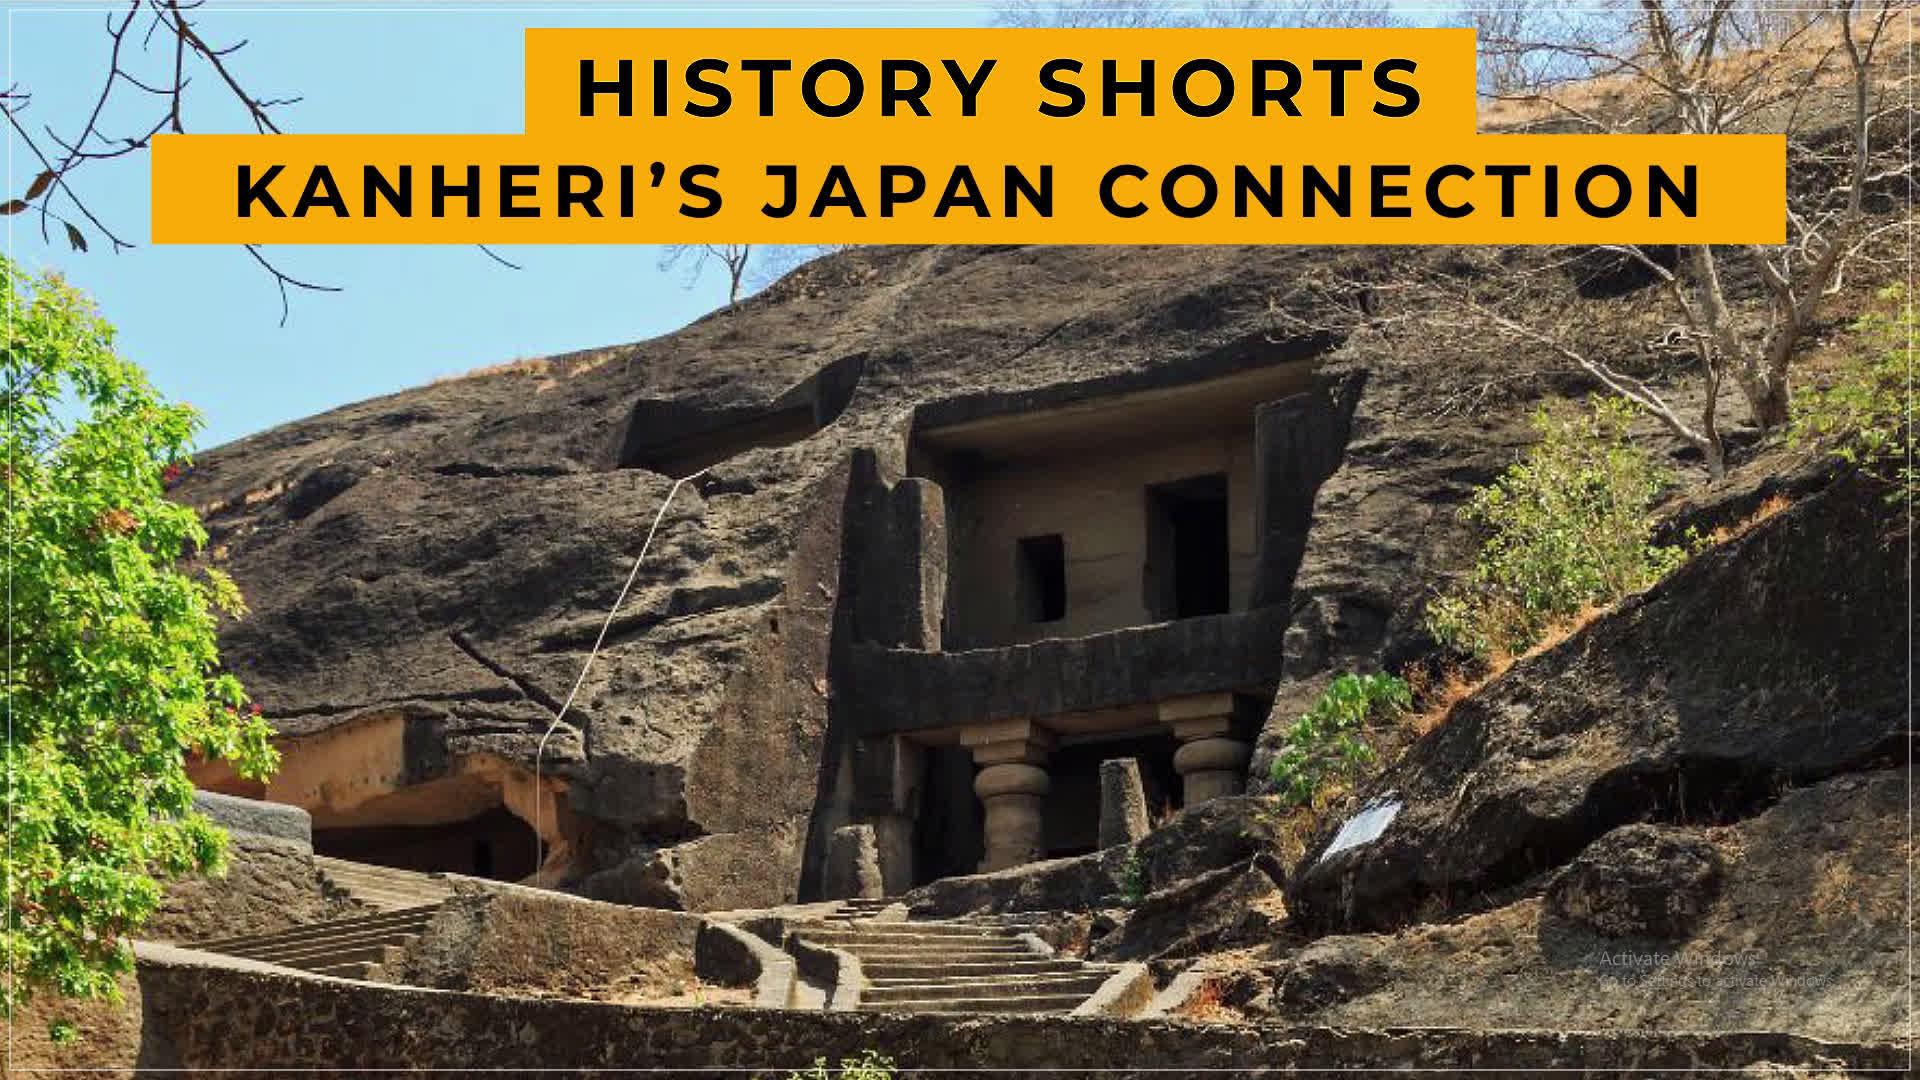 Kanheri's Japan Connection